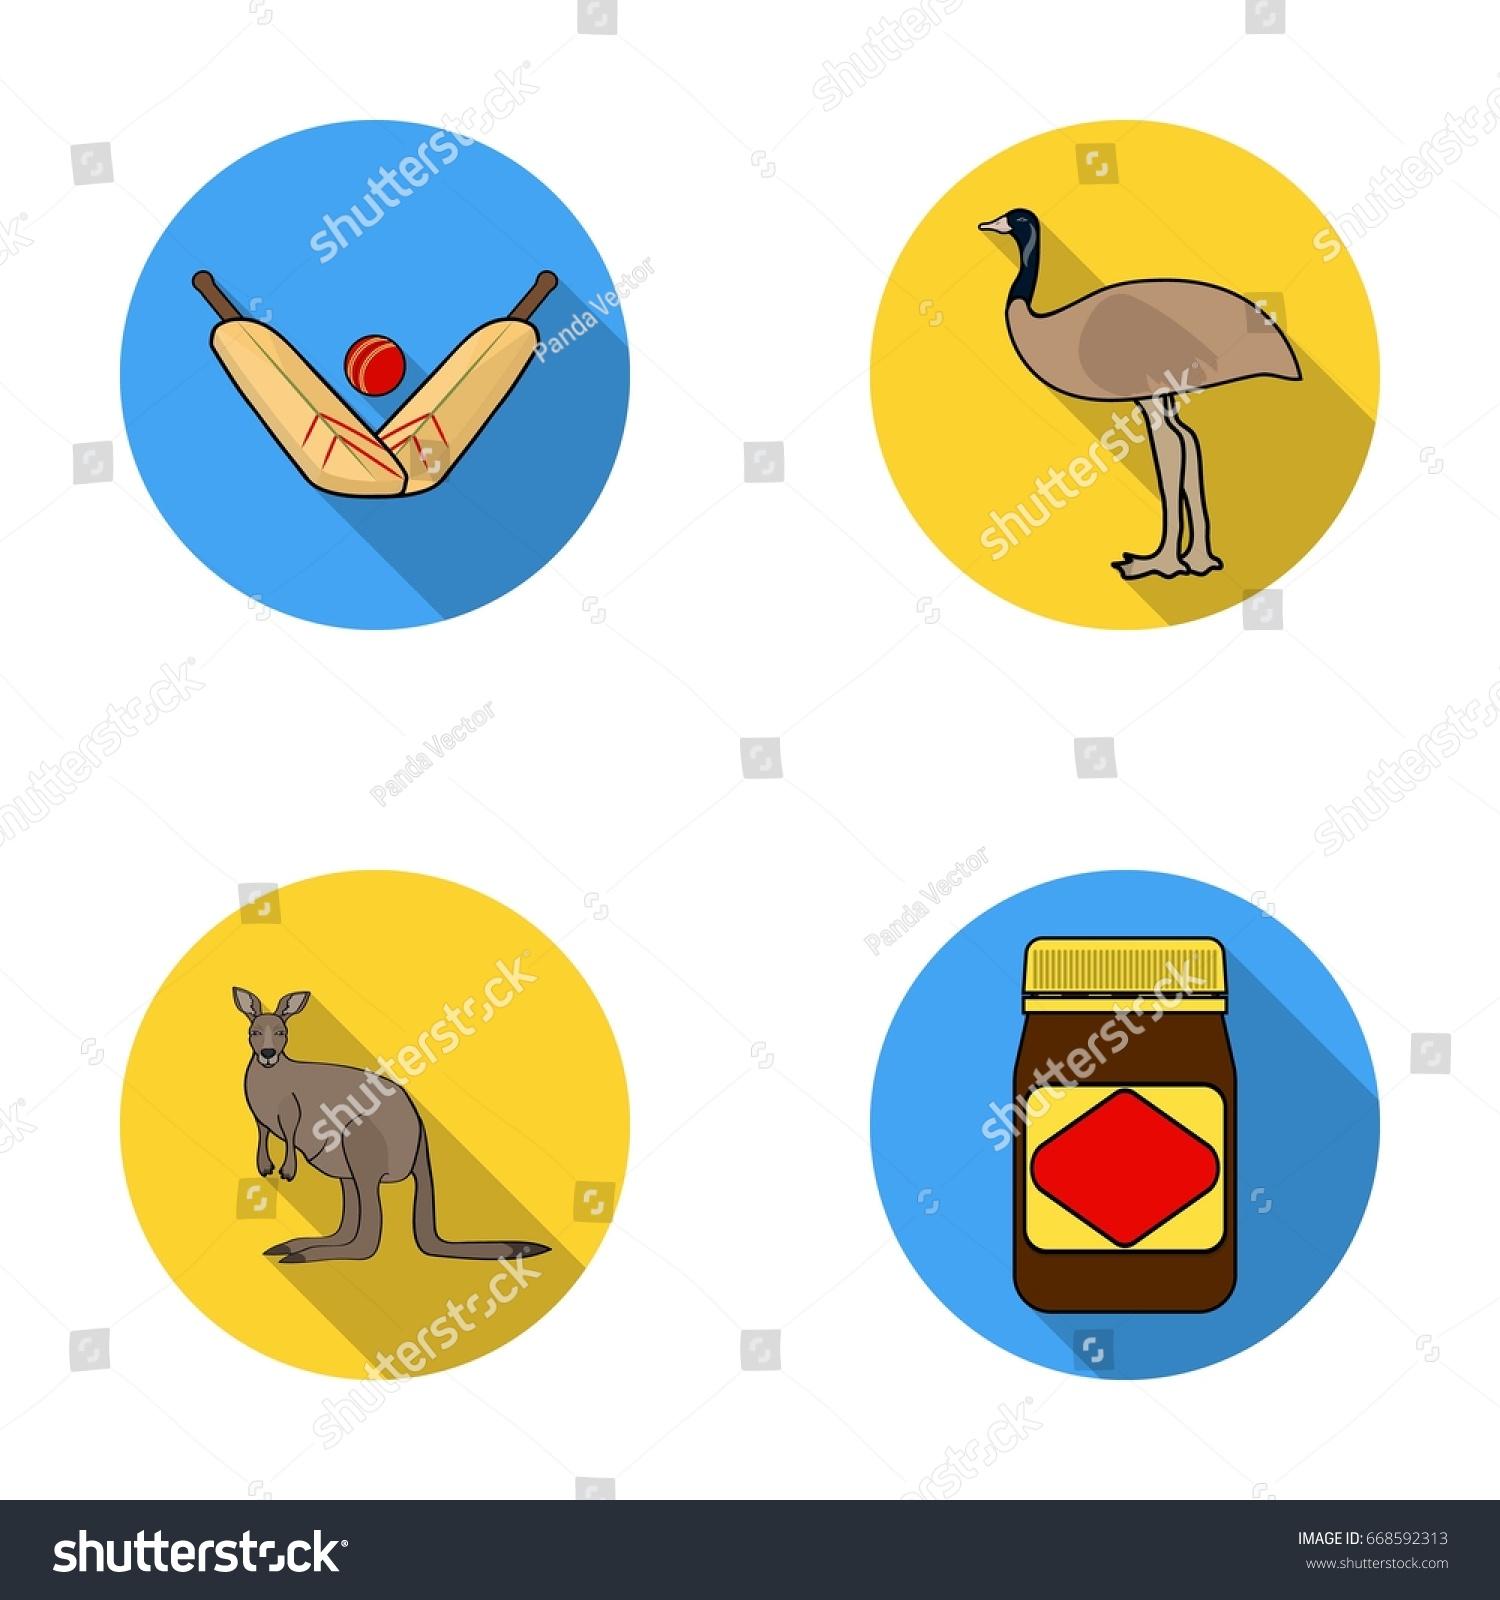 game cricket emu ostrich kangaroo popular stock illustration rh shutterstock com Cartoon Crickets Insect Crickets Chirping